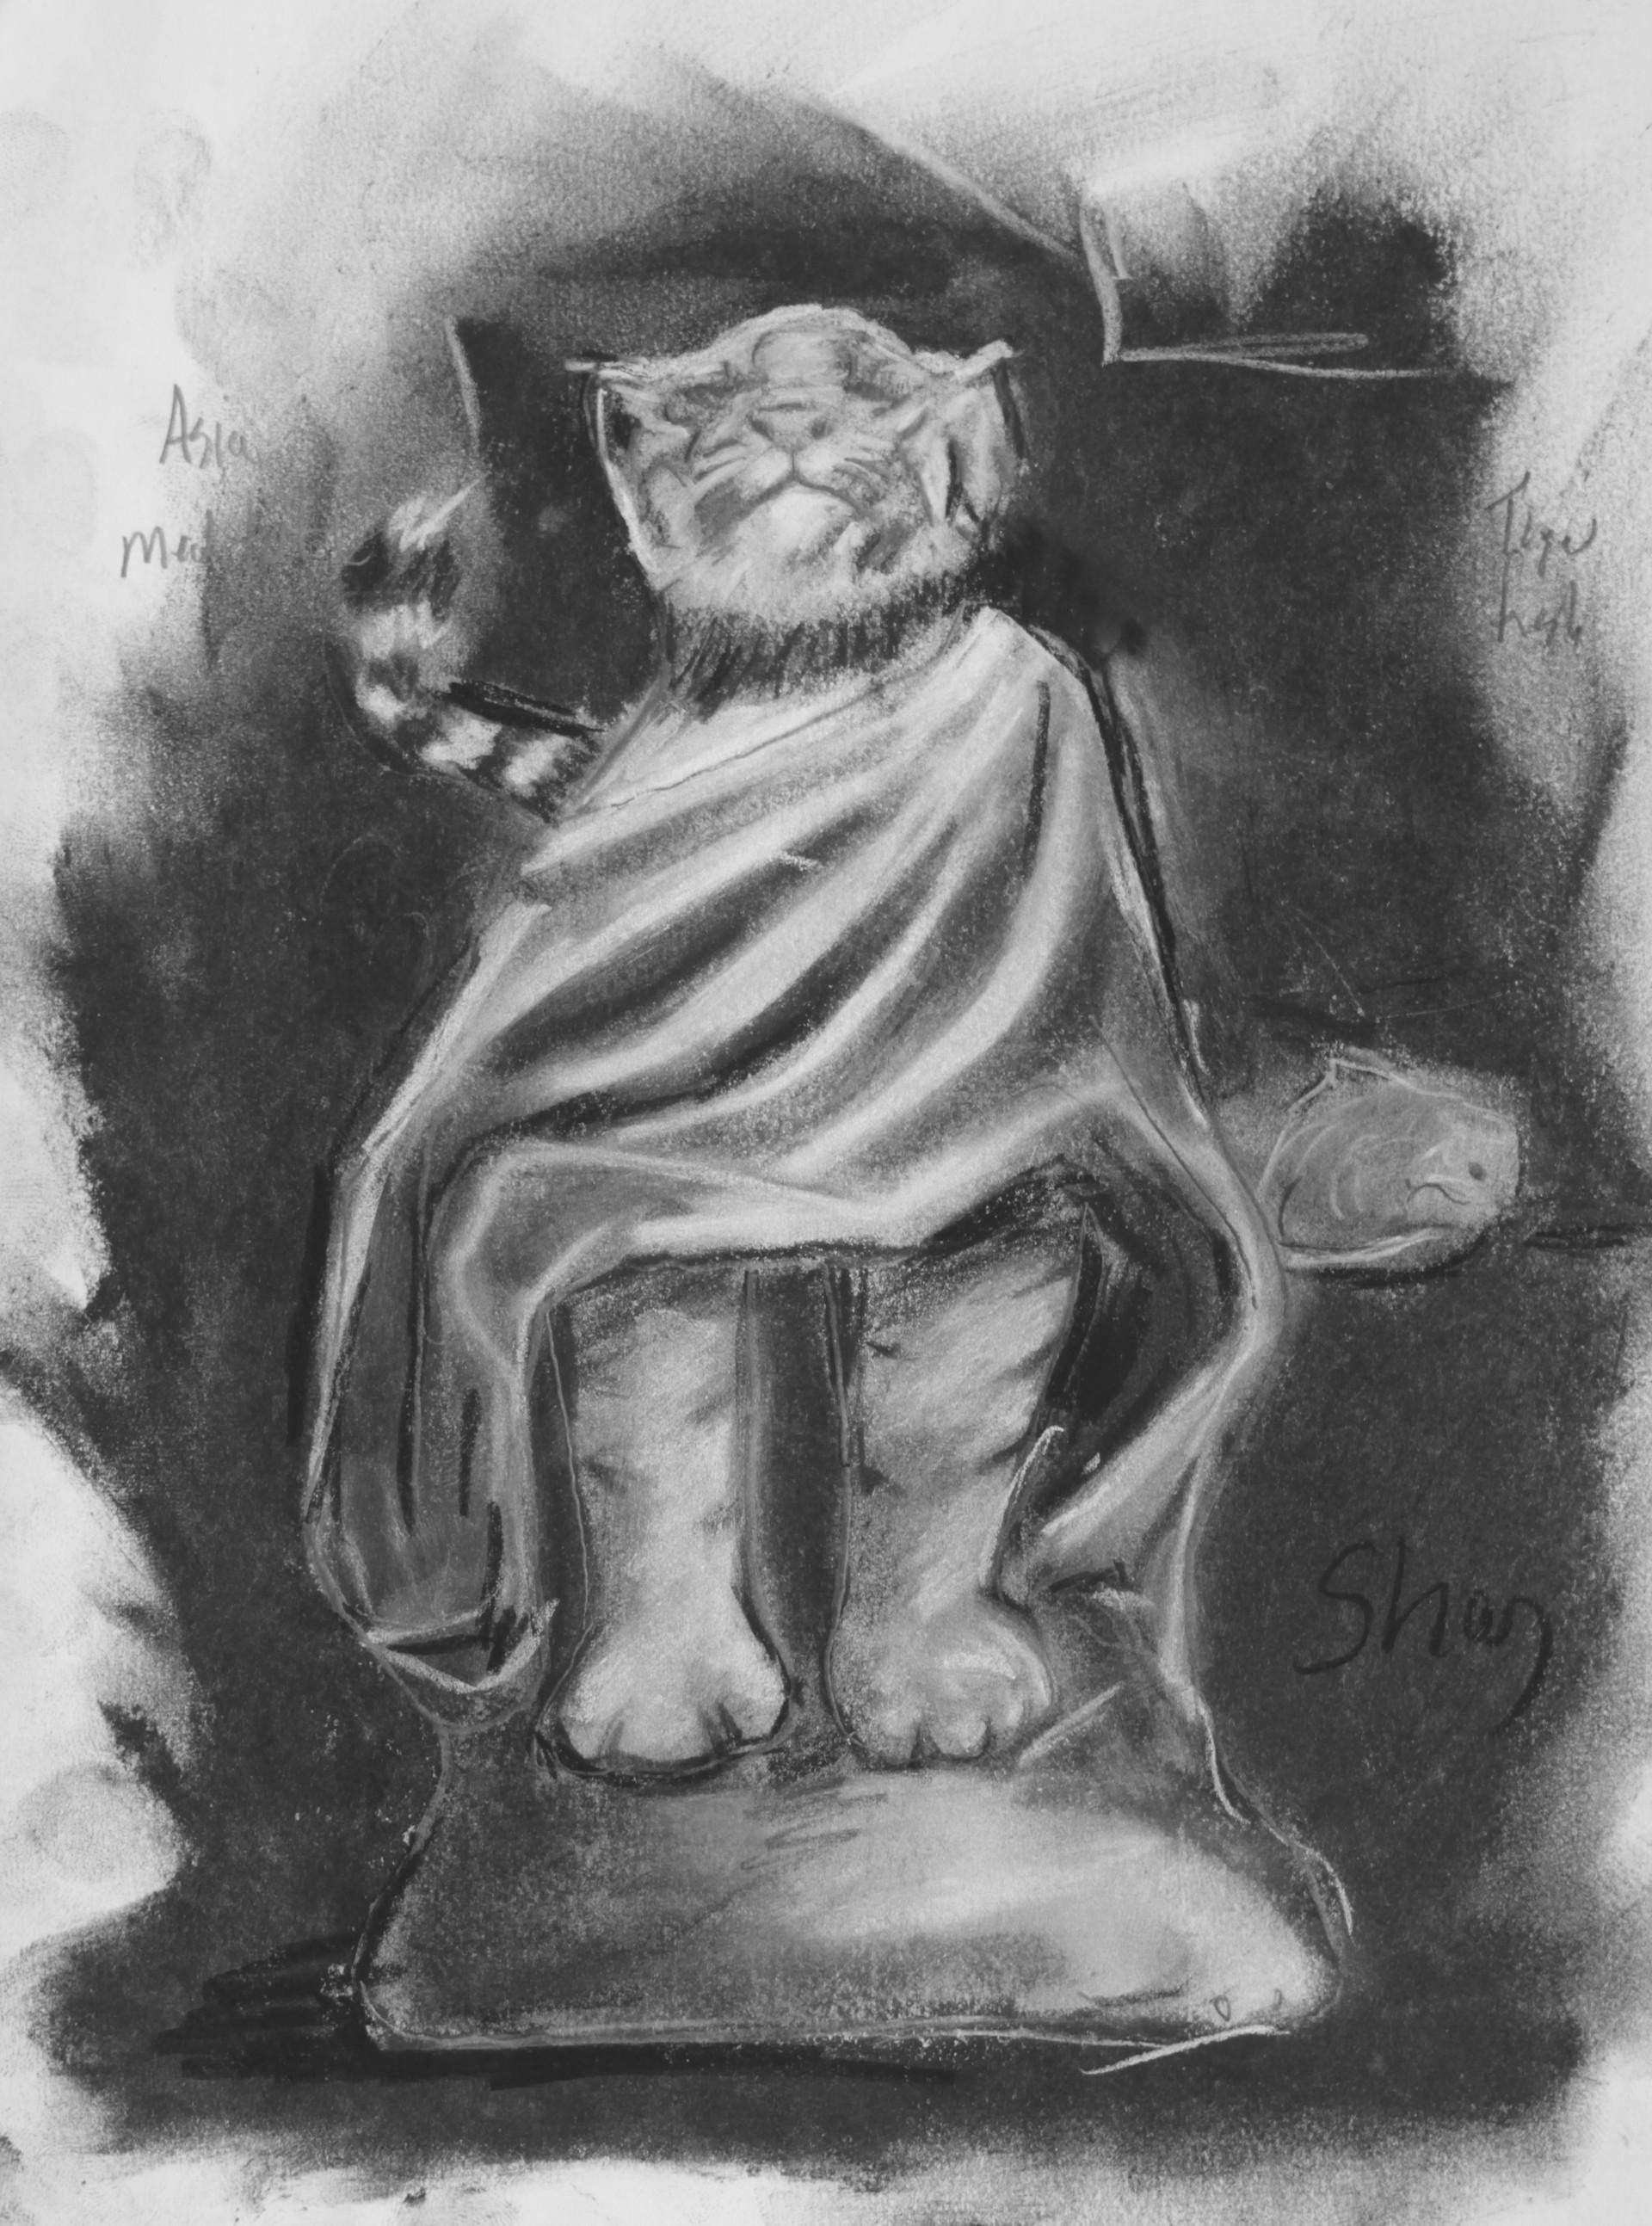 Study 20 by Shay Davis